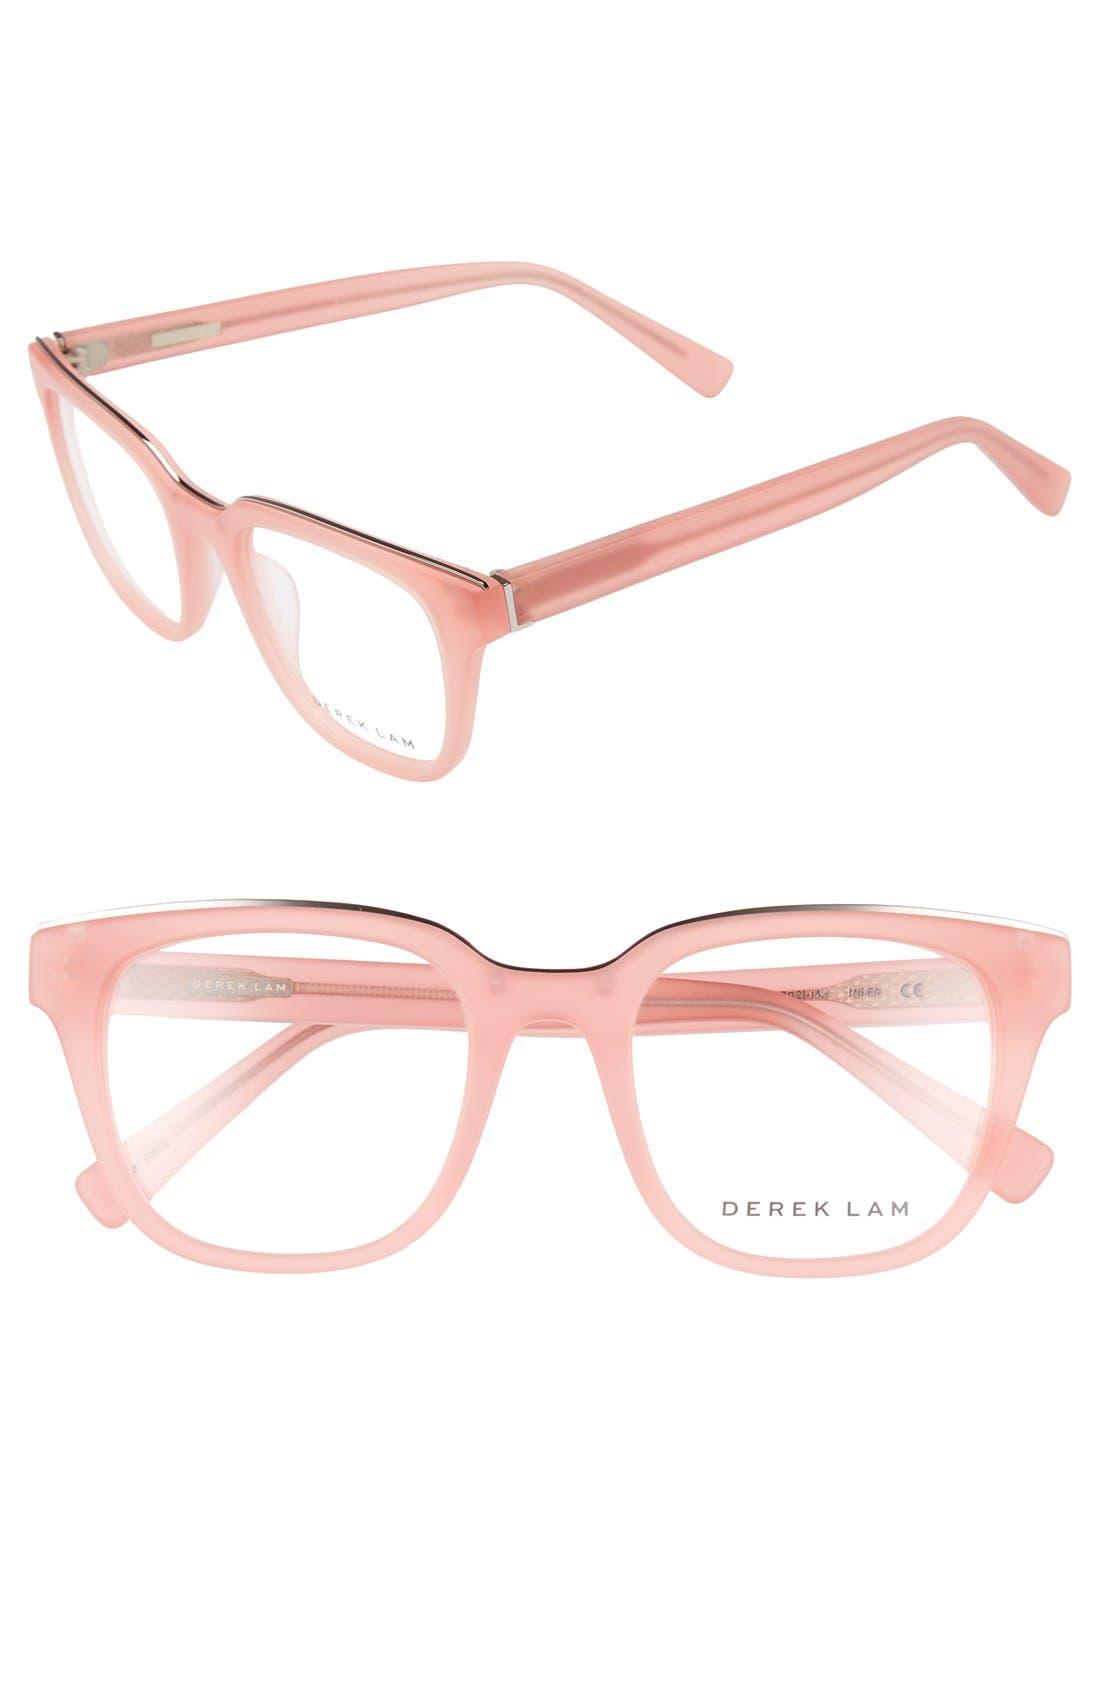 50mm Optical Glasses,                             Main thumbnail 4, color,